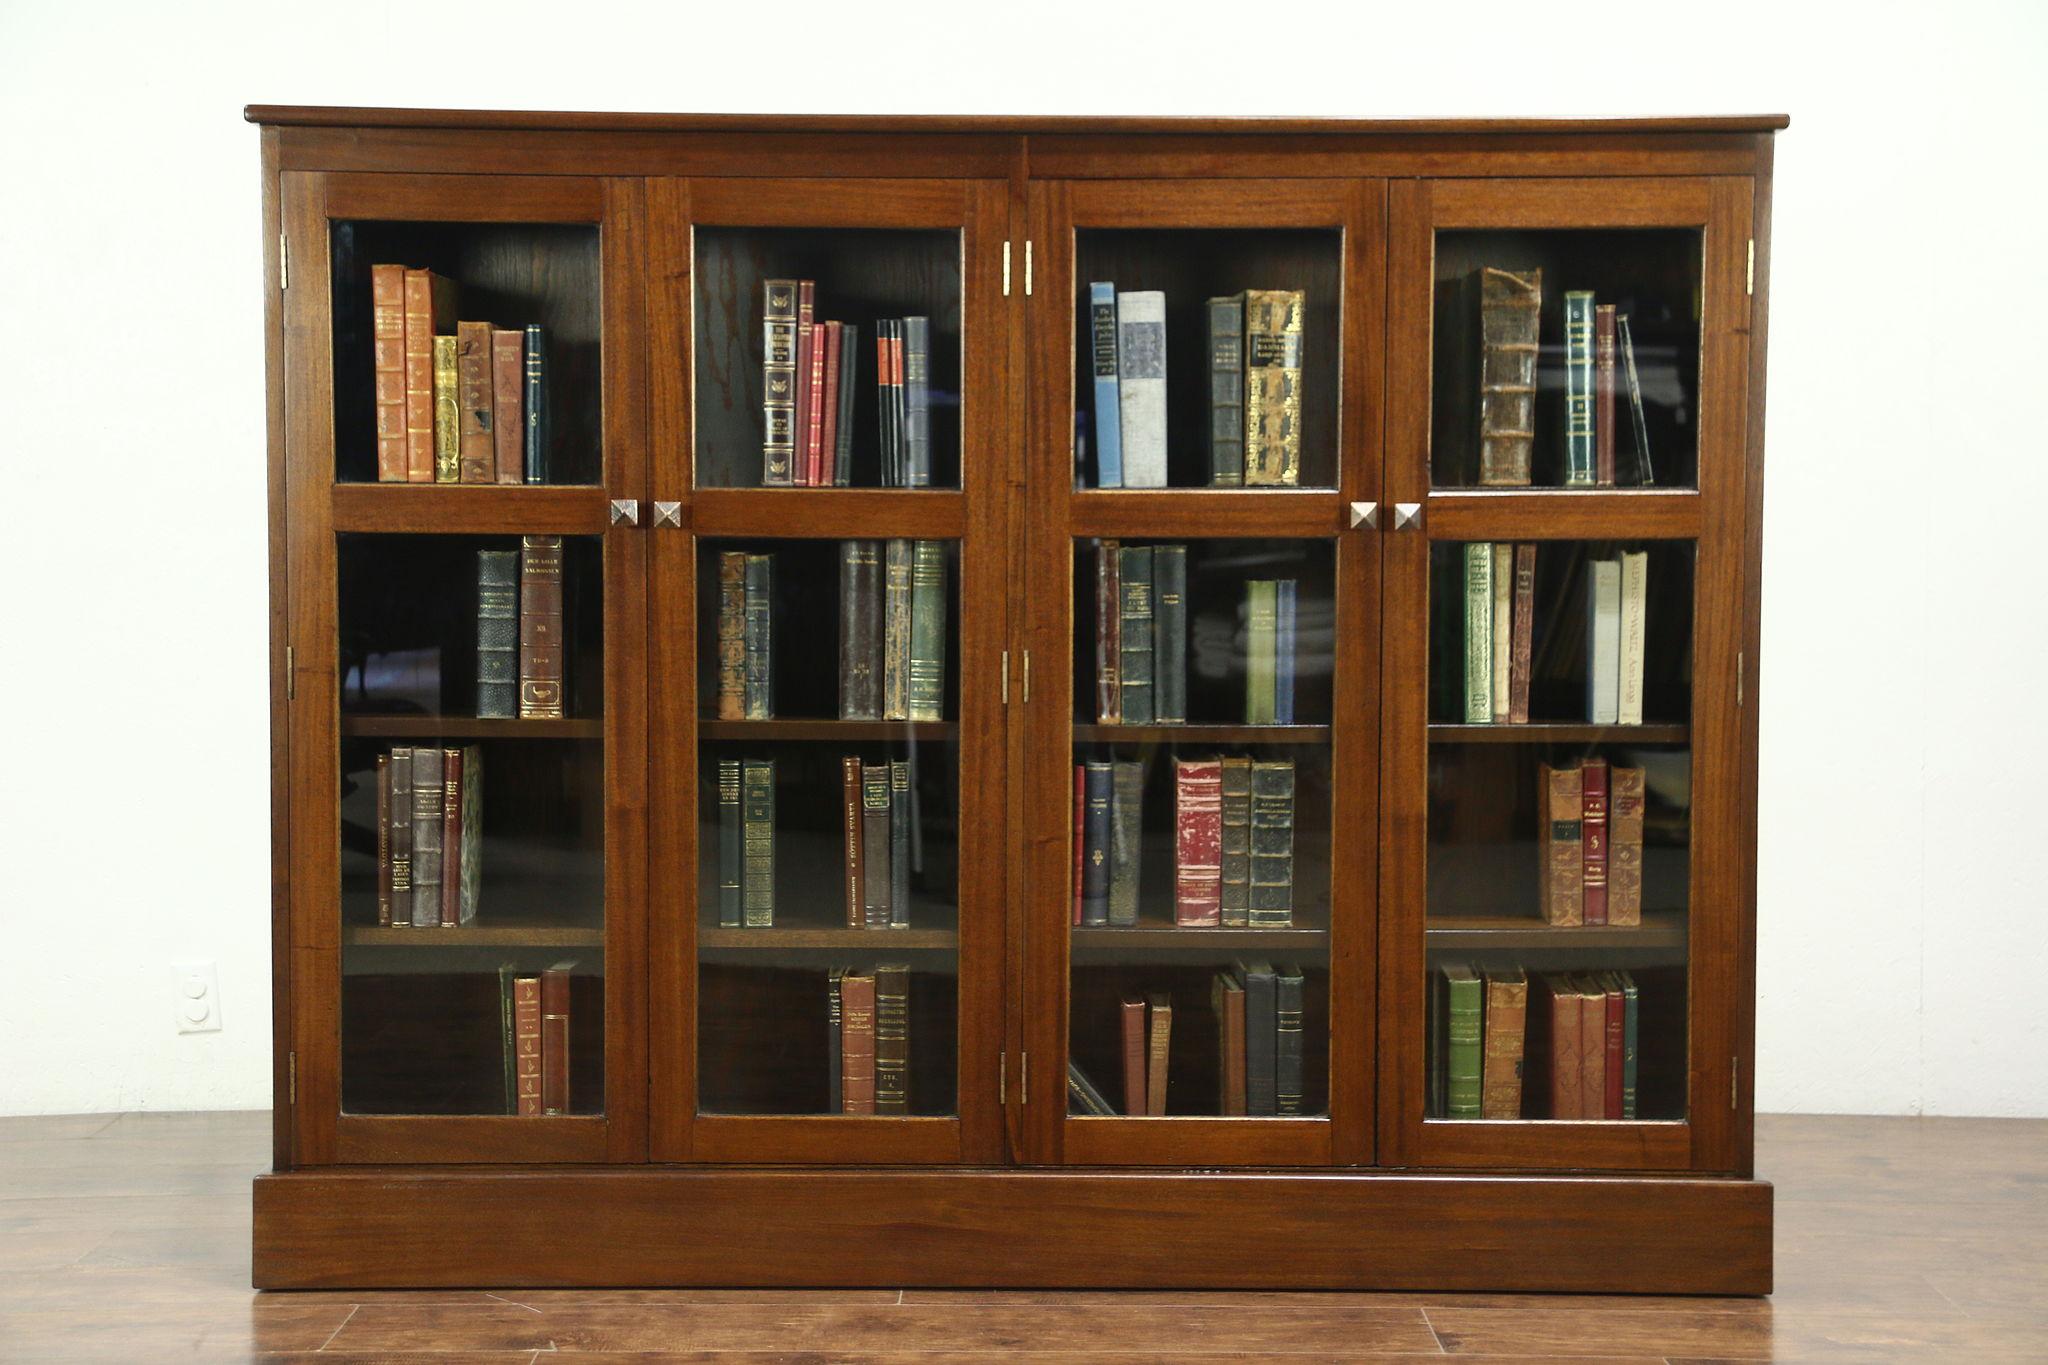 Mahogany 1930 Vintage Library Bookcase 4 Doors Adjustable Shelves